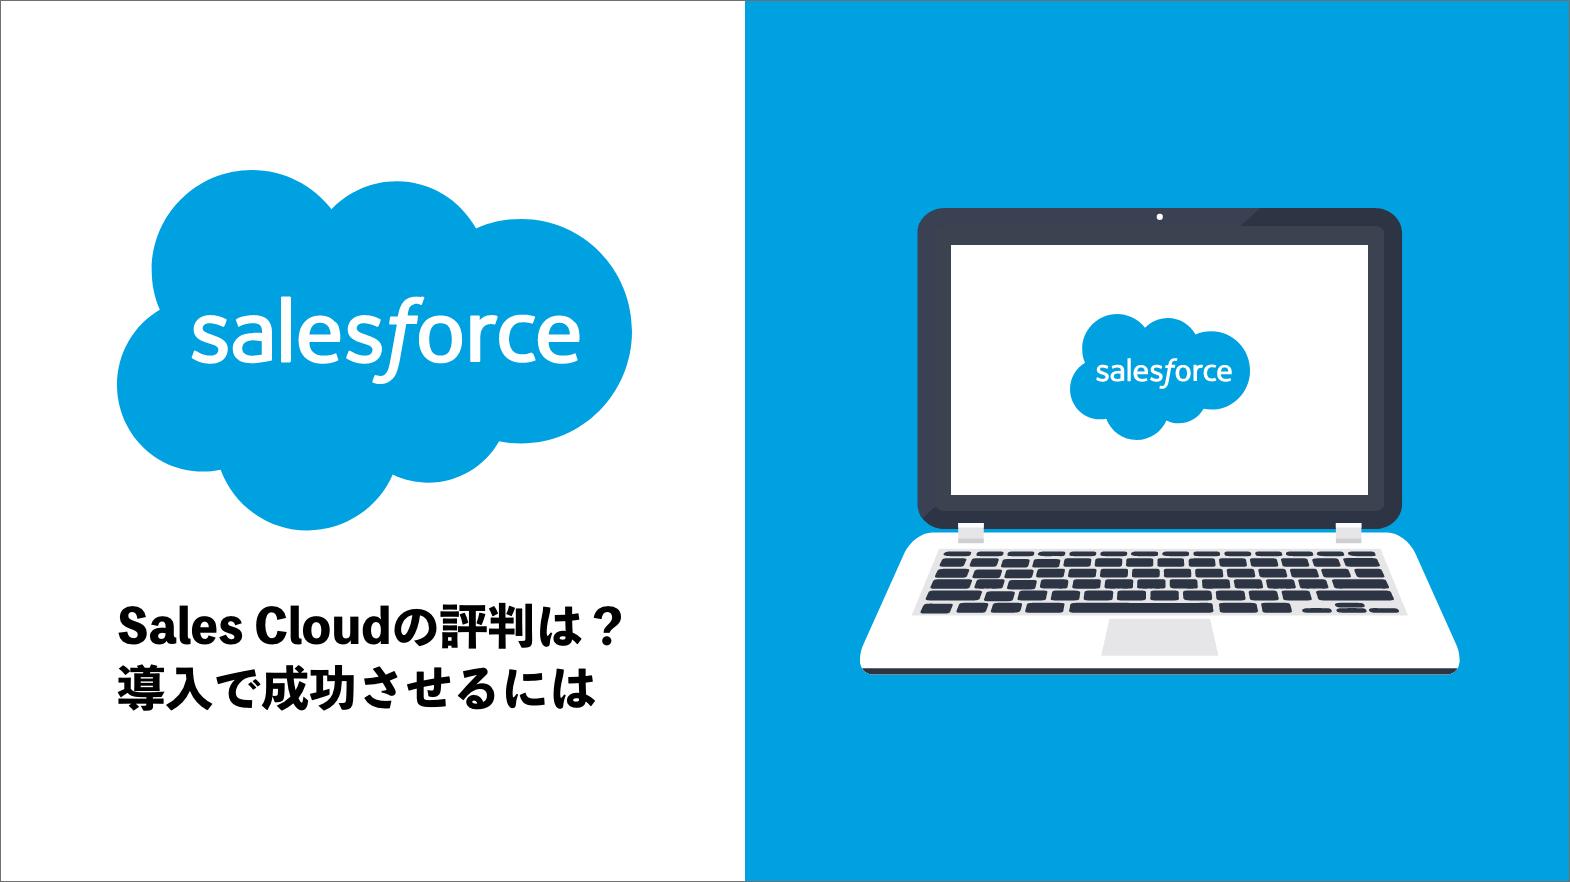 Salesforce(セールスフォース)のSales Cloudの評判は?導入で成功させるには